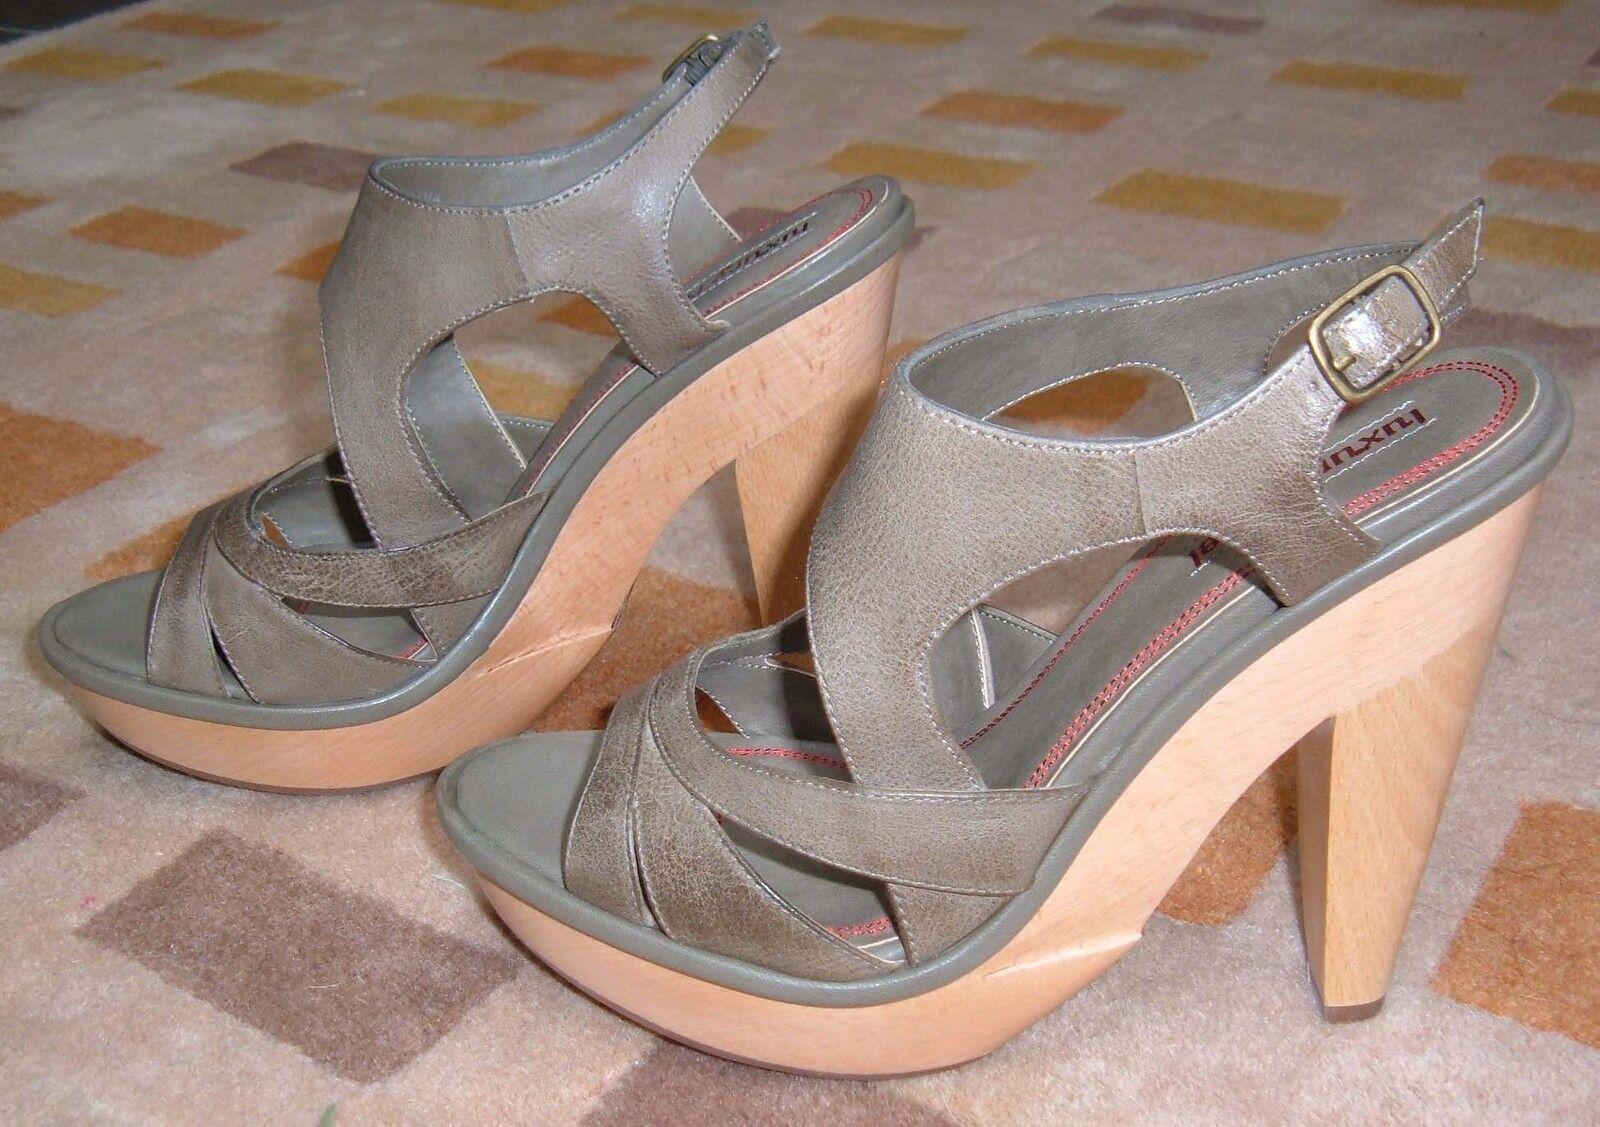 Luxury Rebel Nadia olive high heel platform sandals sandals sandals GILT 8 38.5 NIB a81425